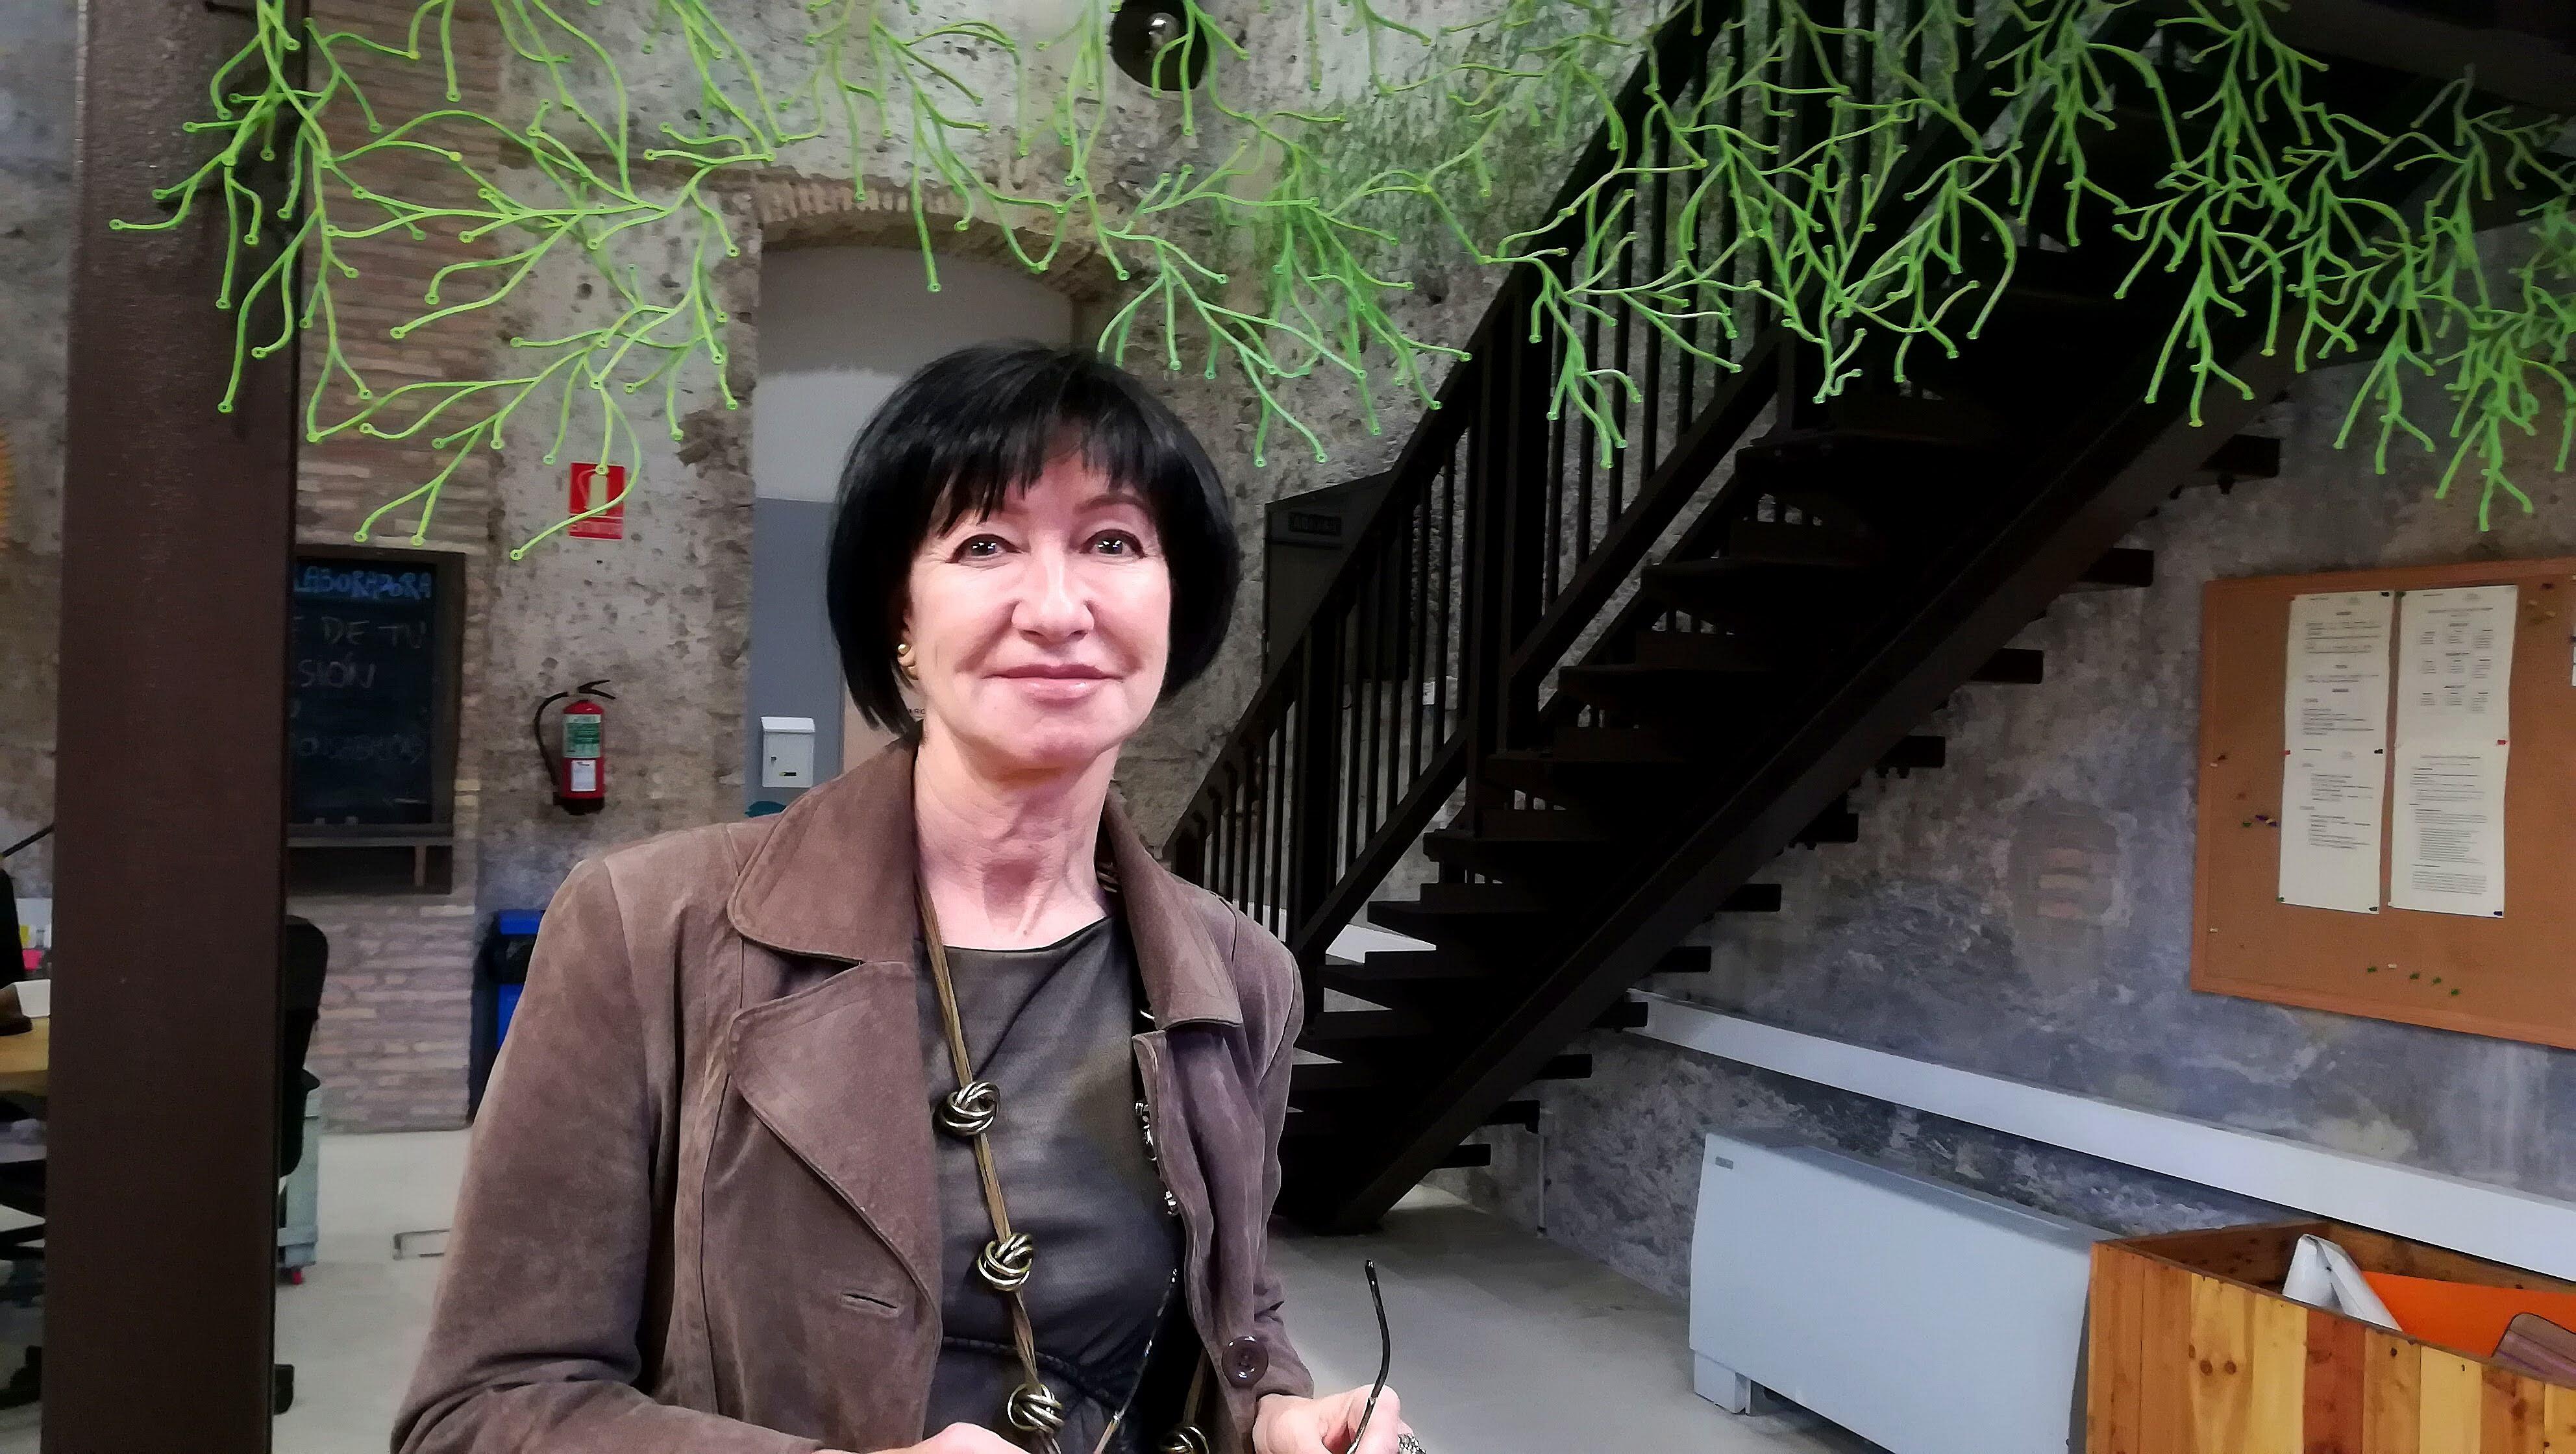 Rosa Esteban y Programa Soy Futuro